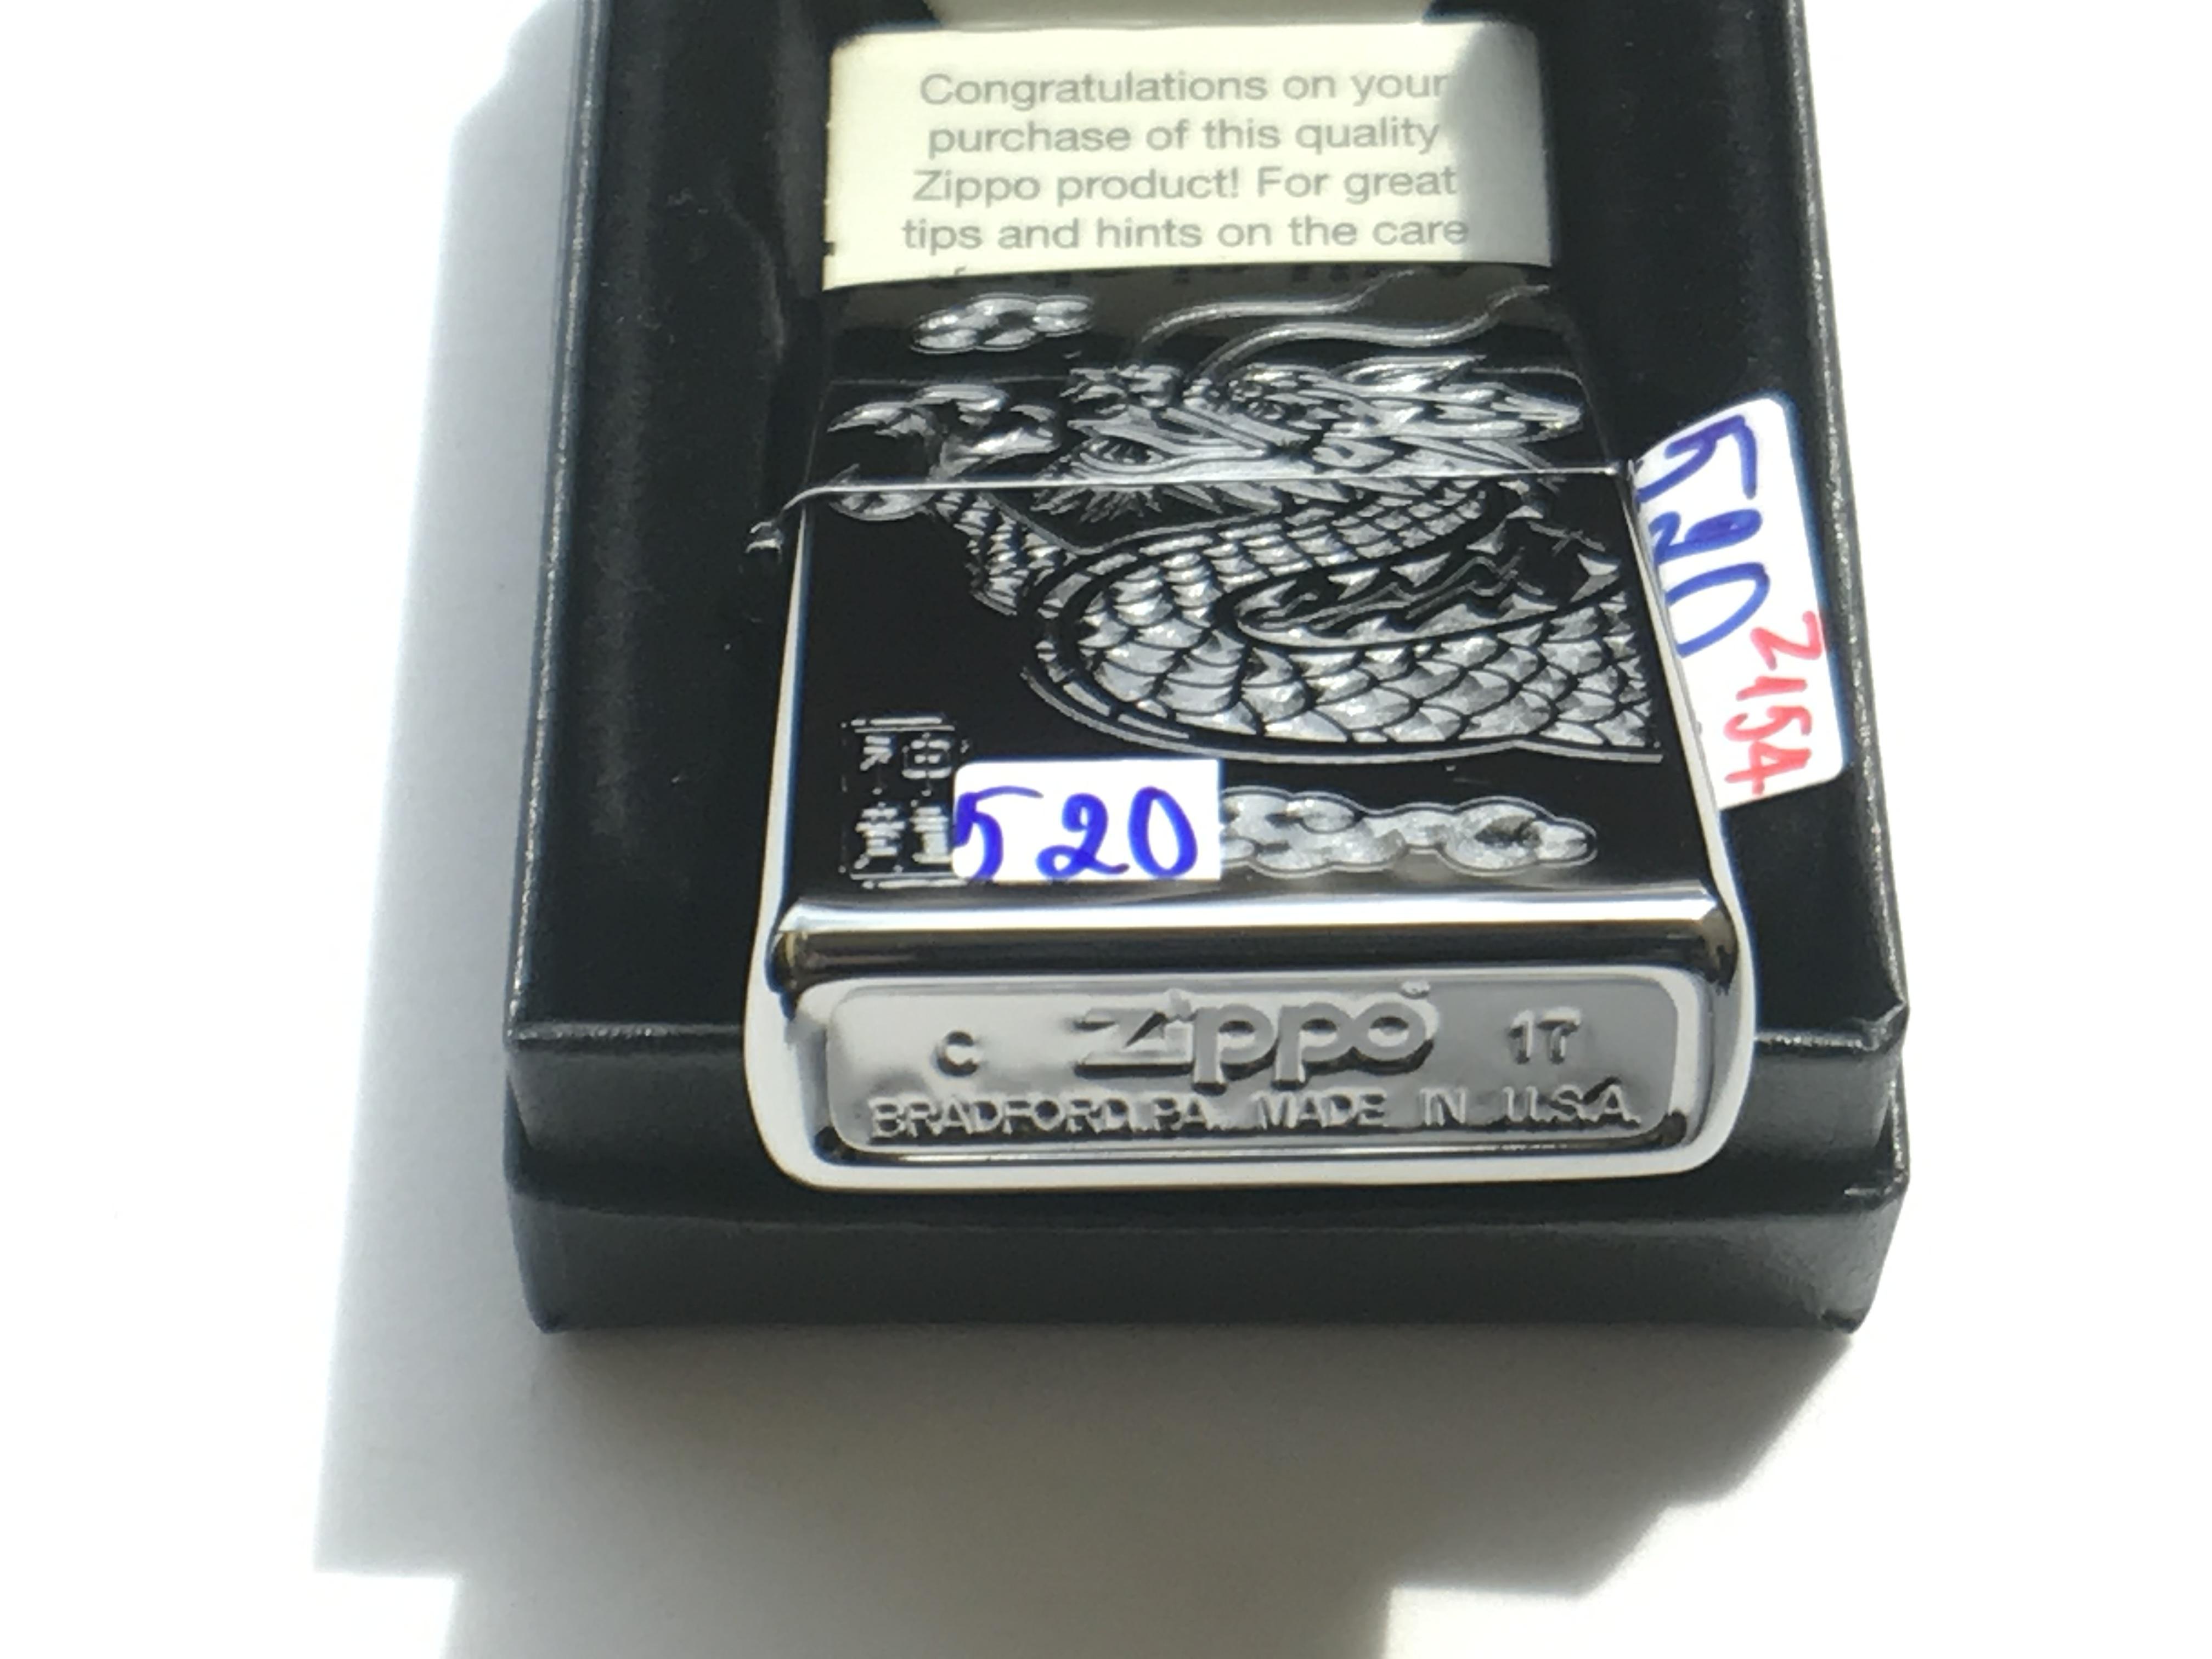 Zippo khac 3D 2 mat hinh dau rong ntz547 2